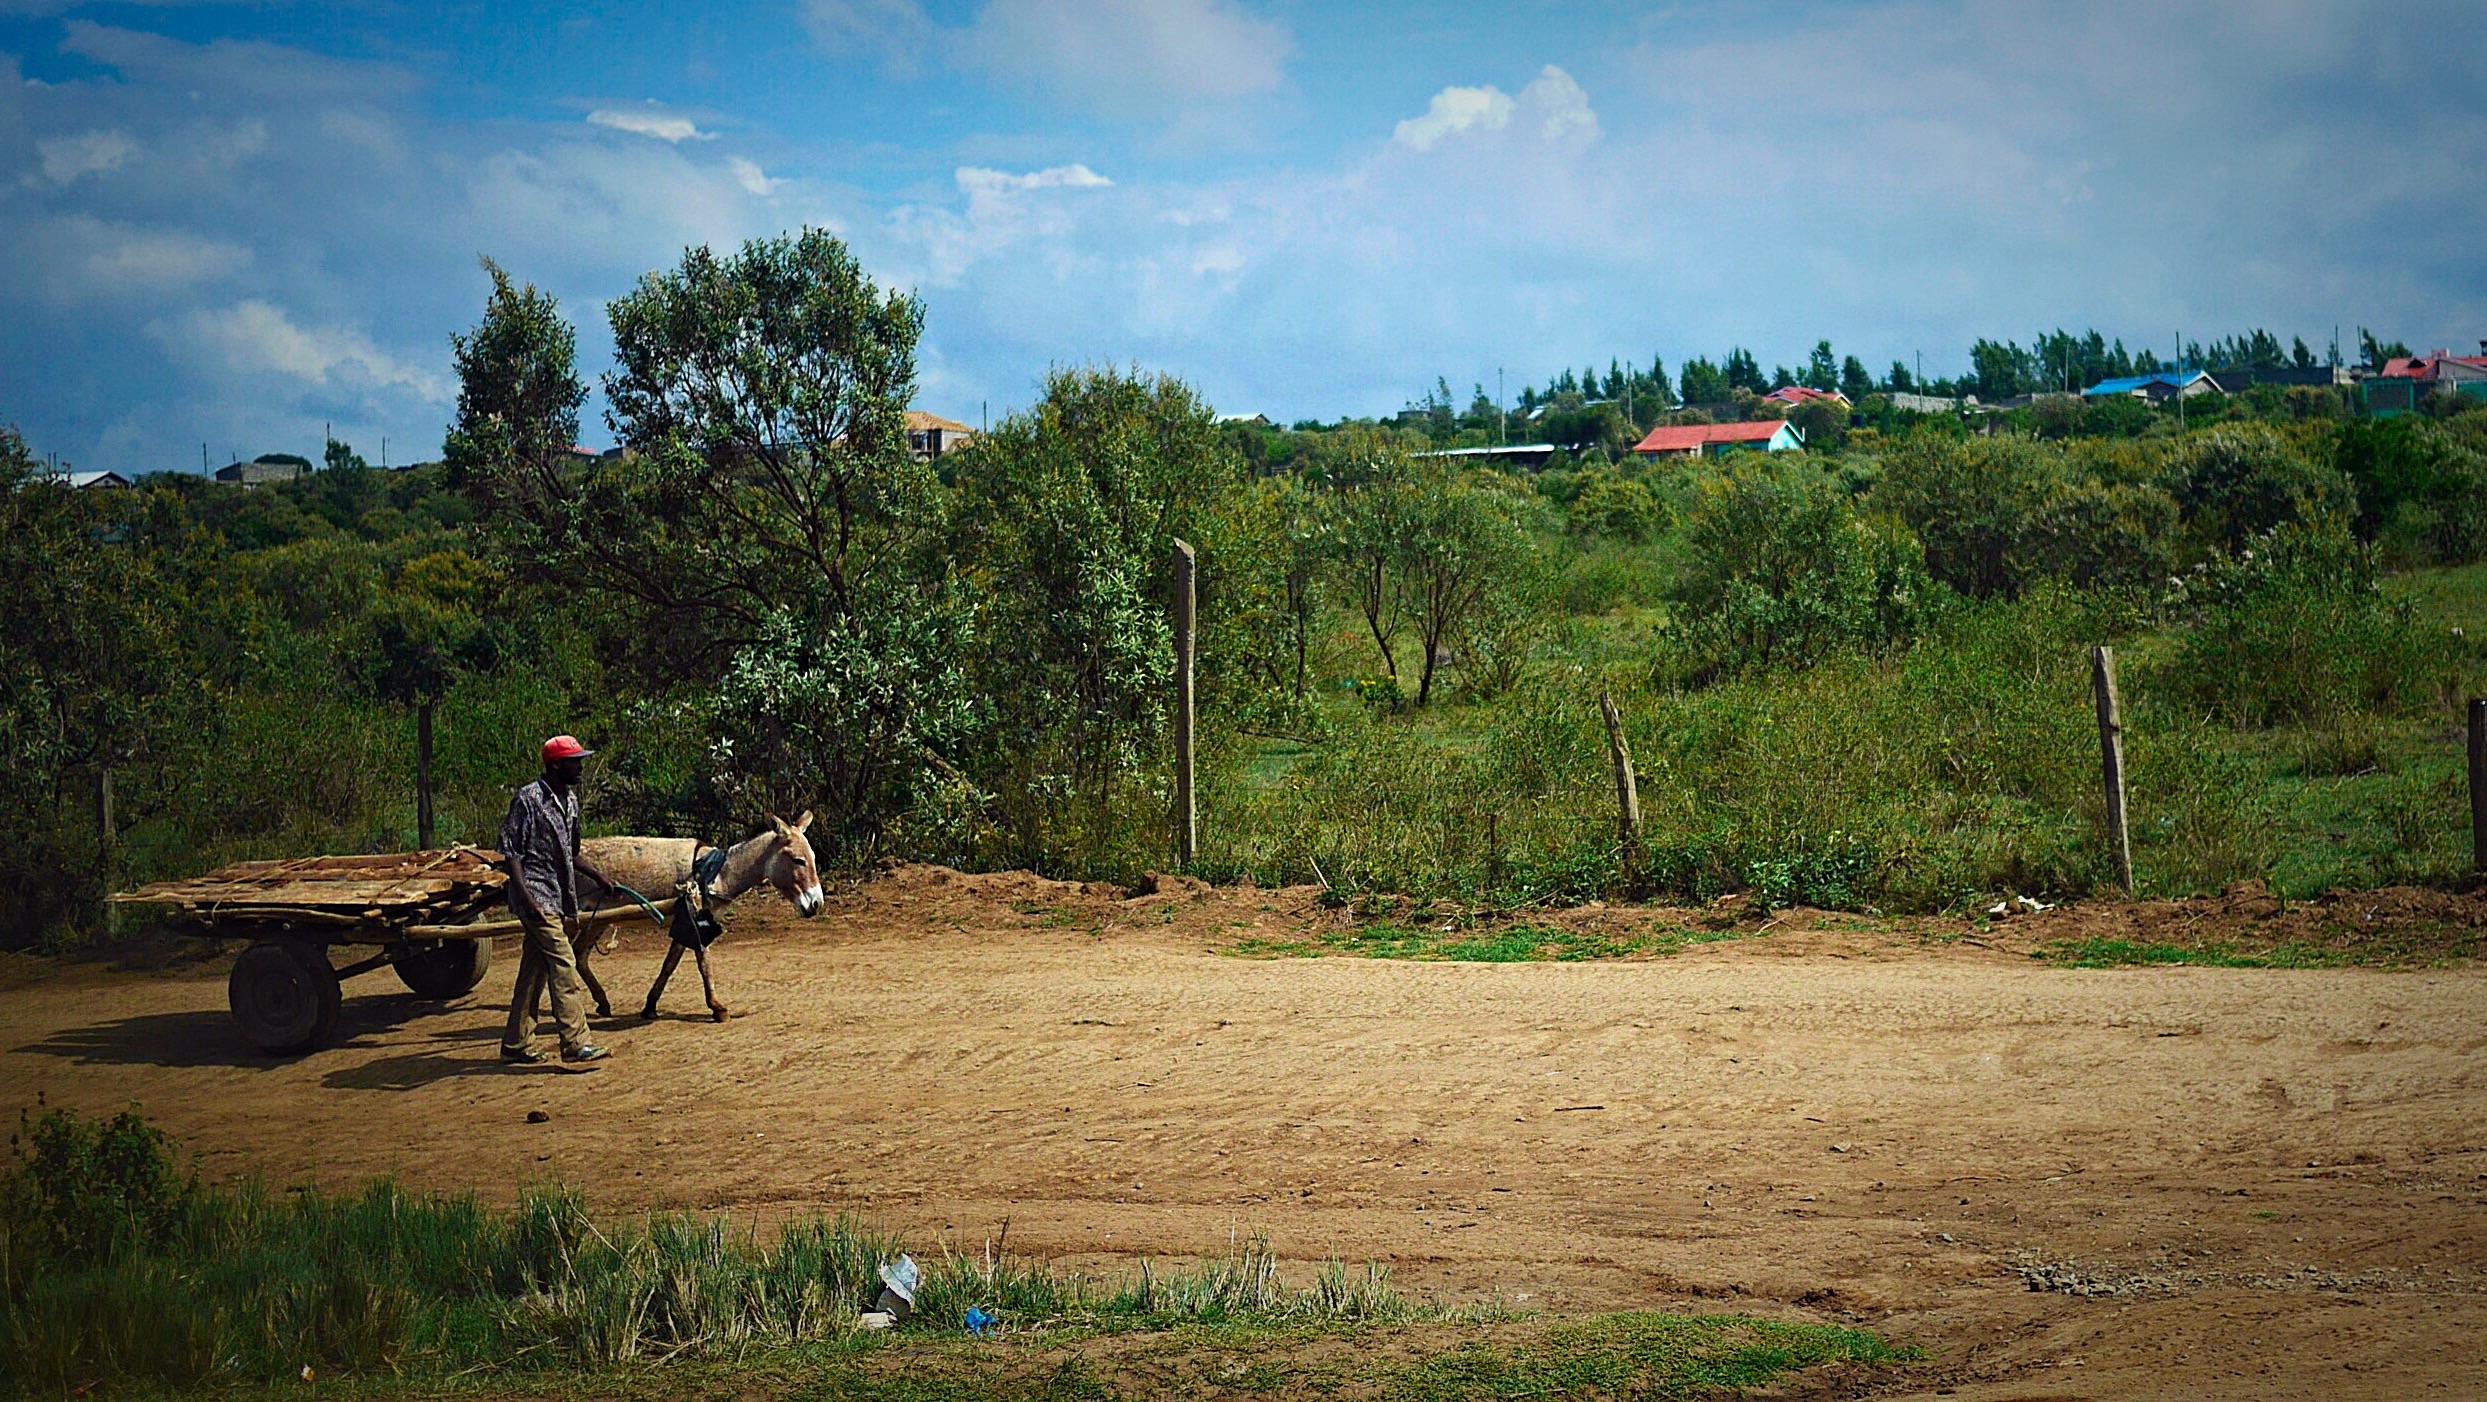 Local Kenyan pulling donkey